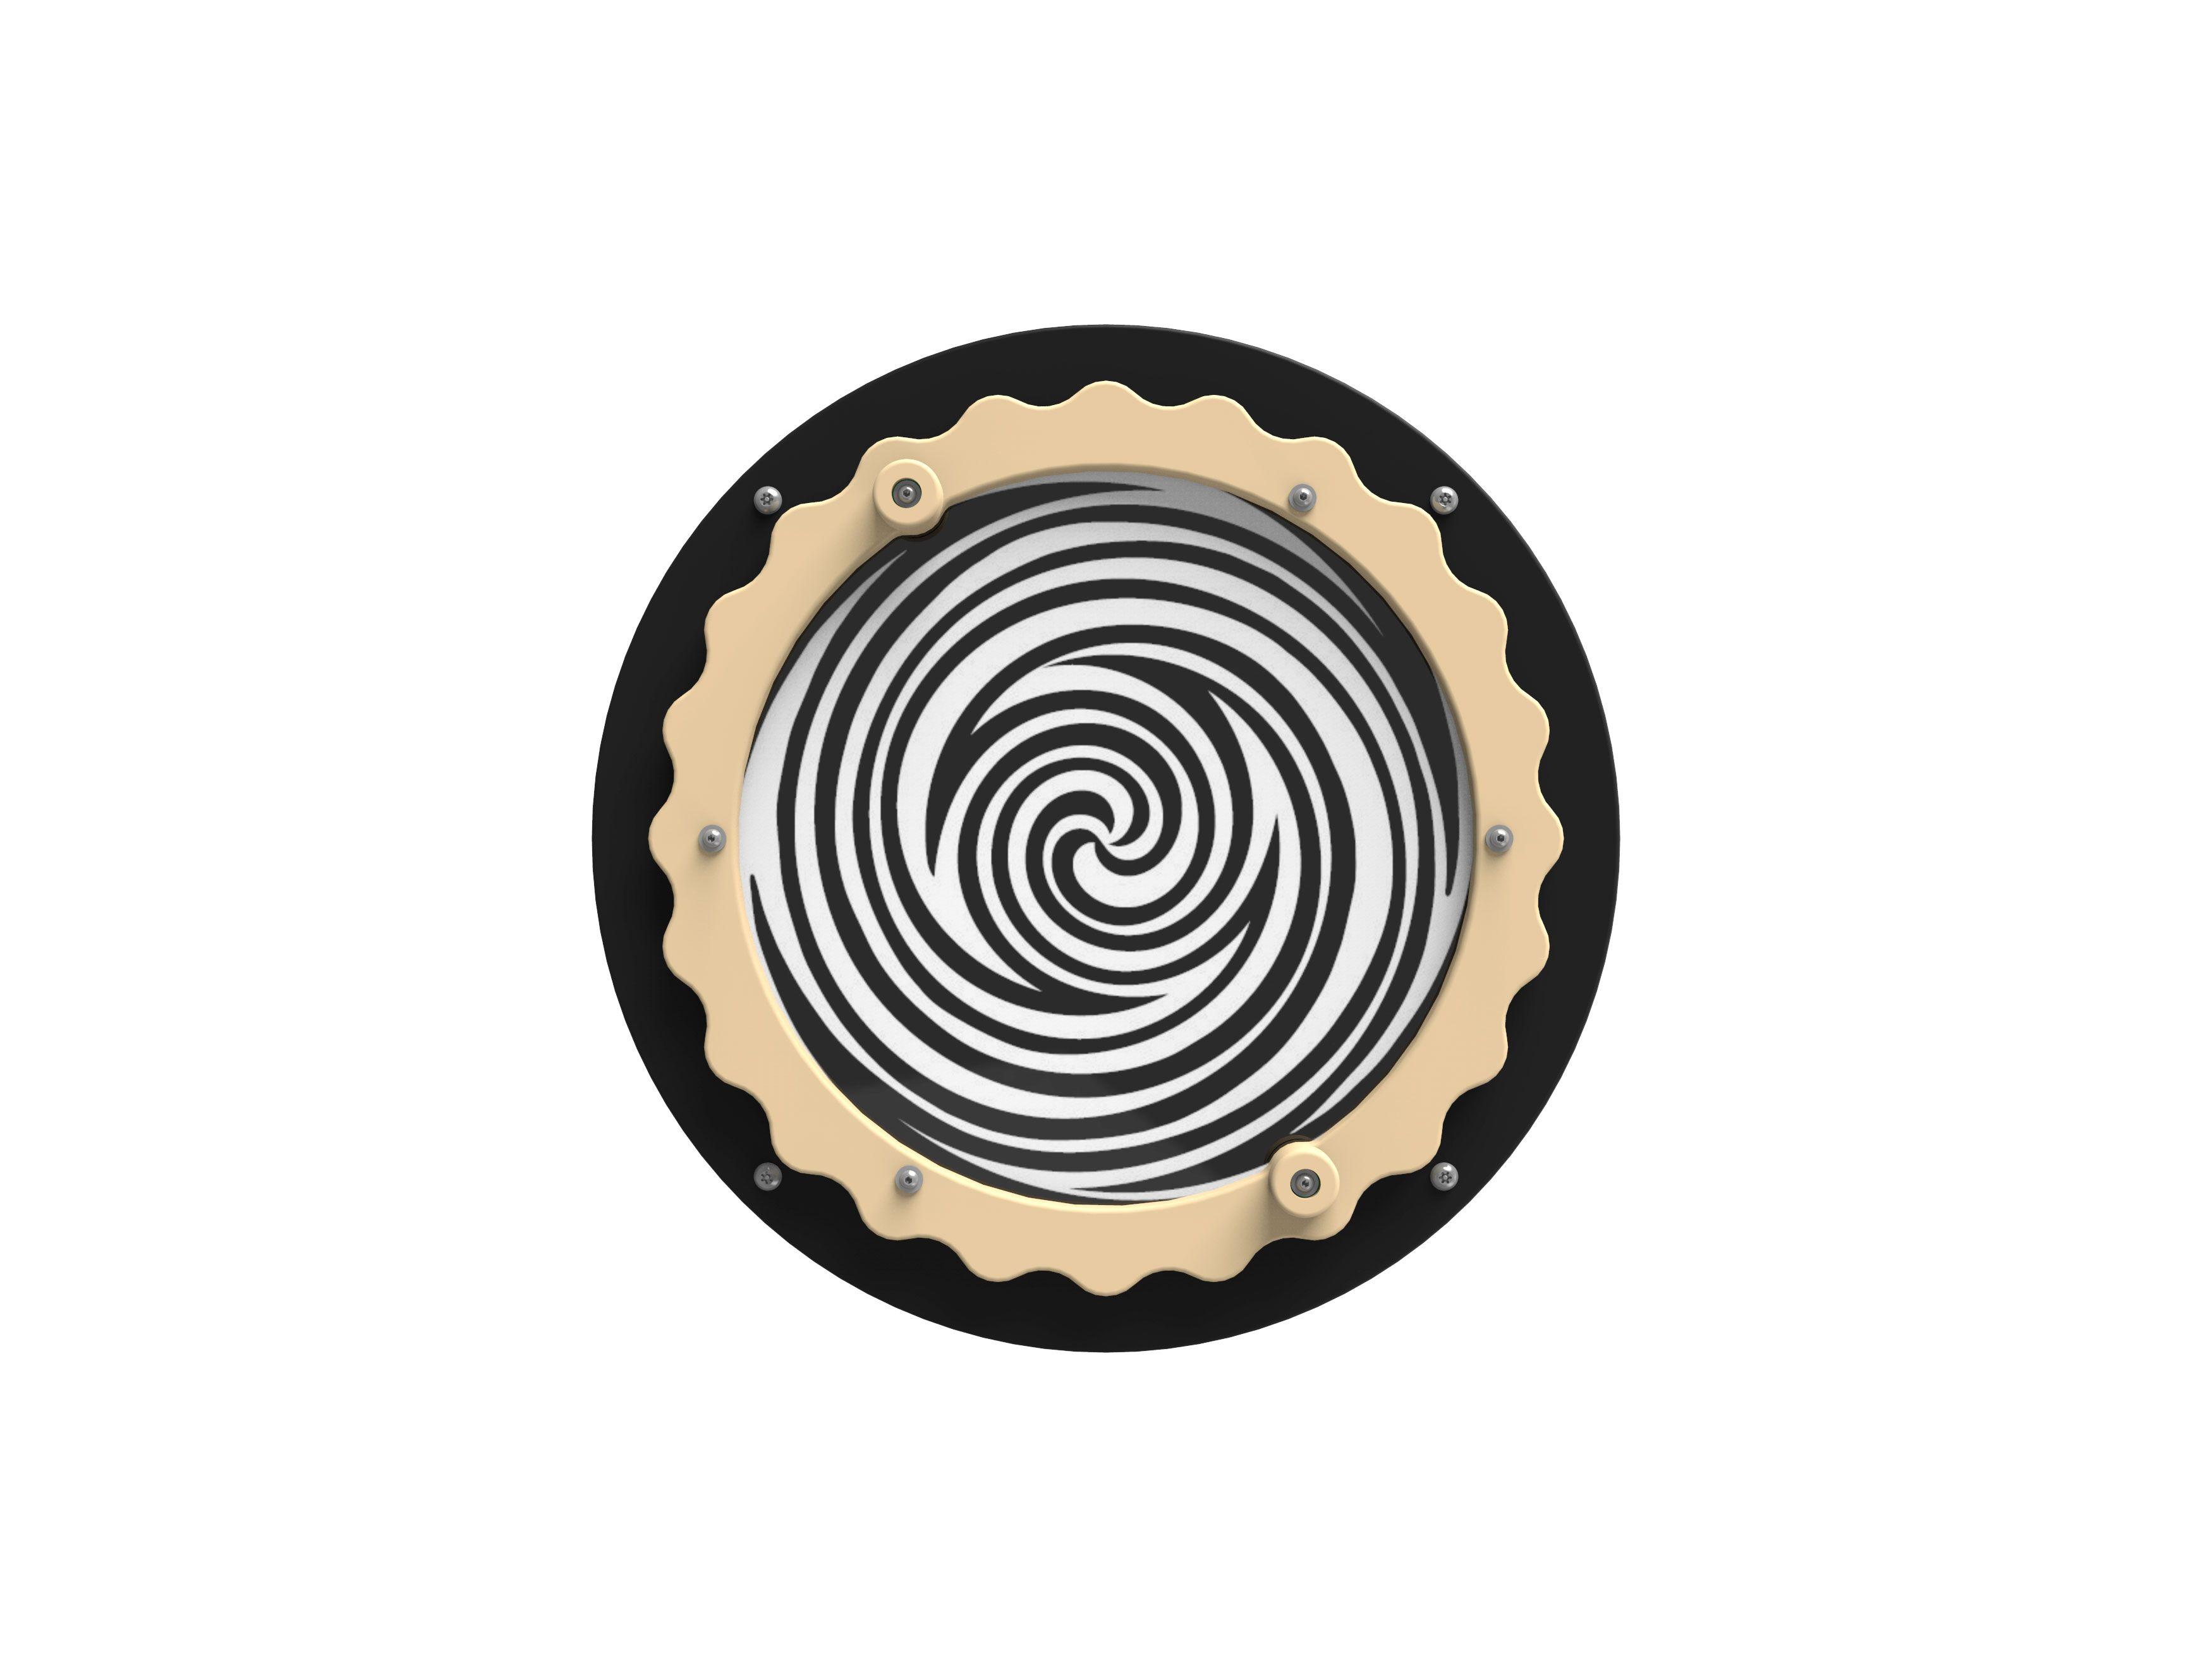 Hypnotize Panel Insert